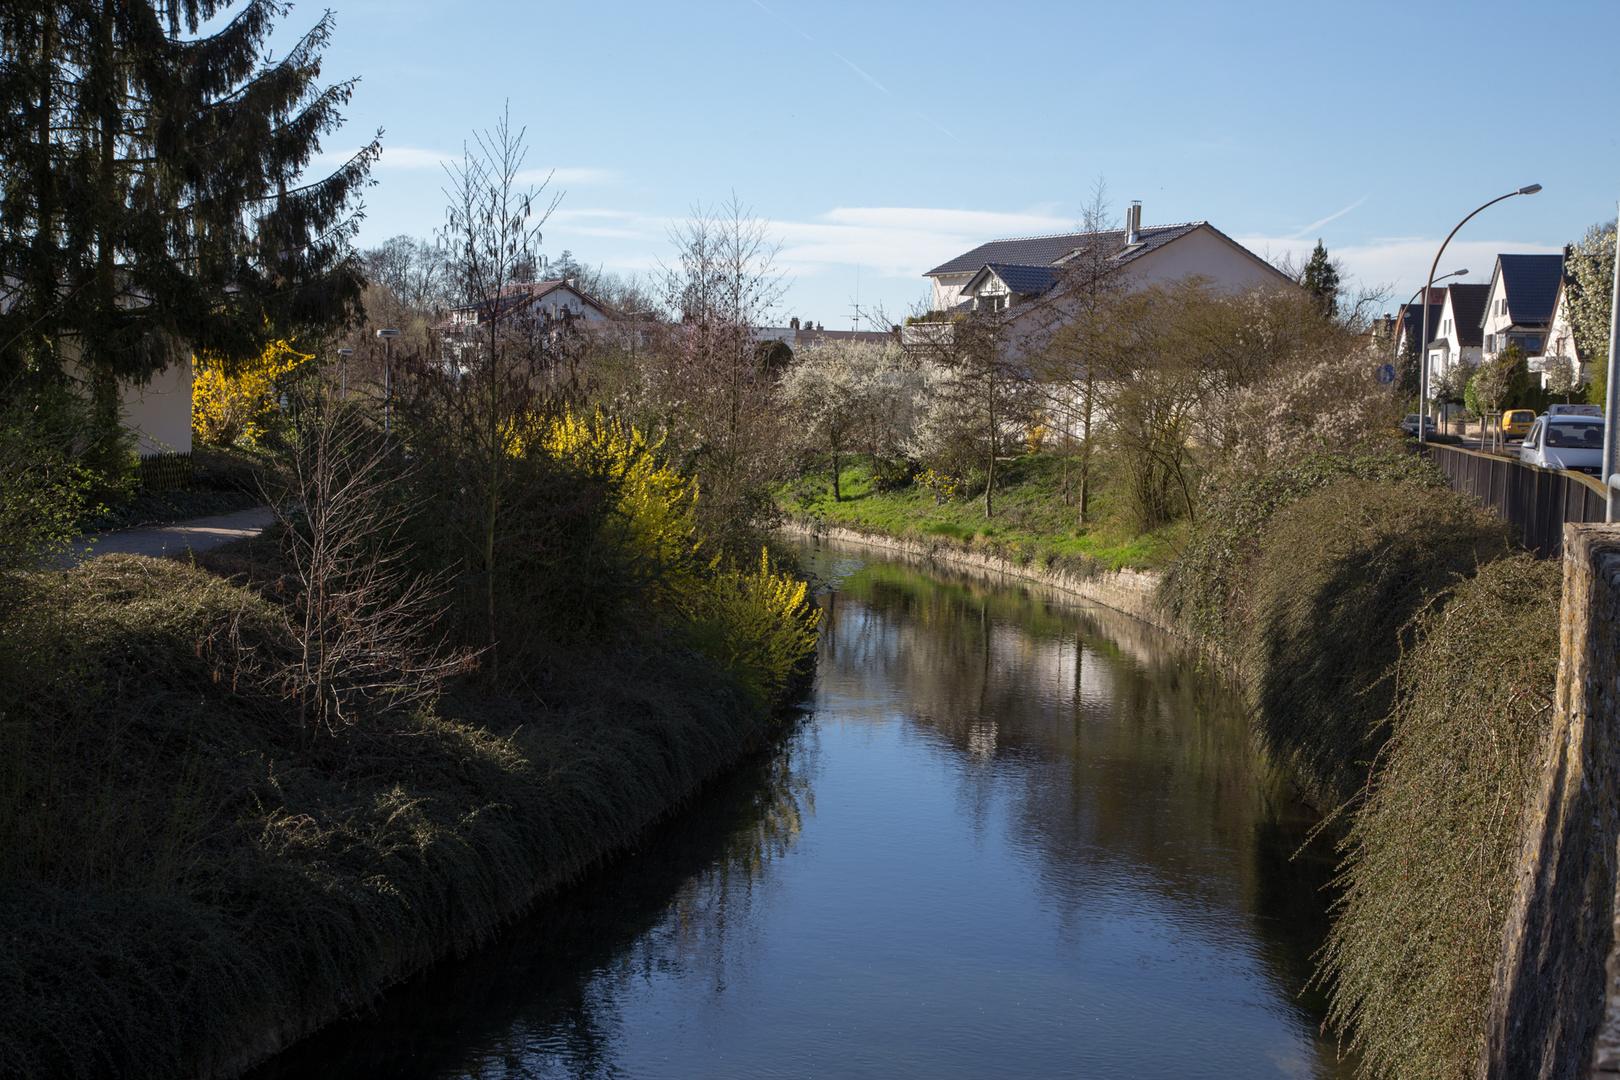 Spaziergang am Saalbach 16